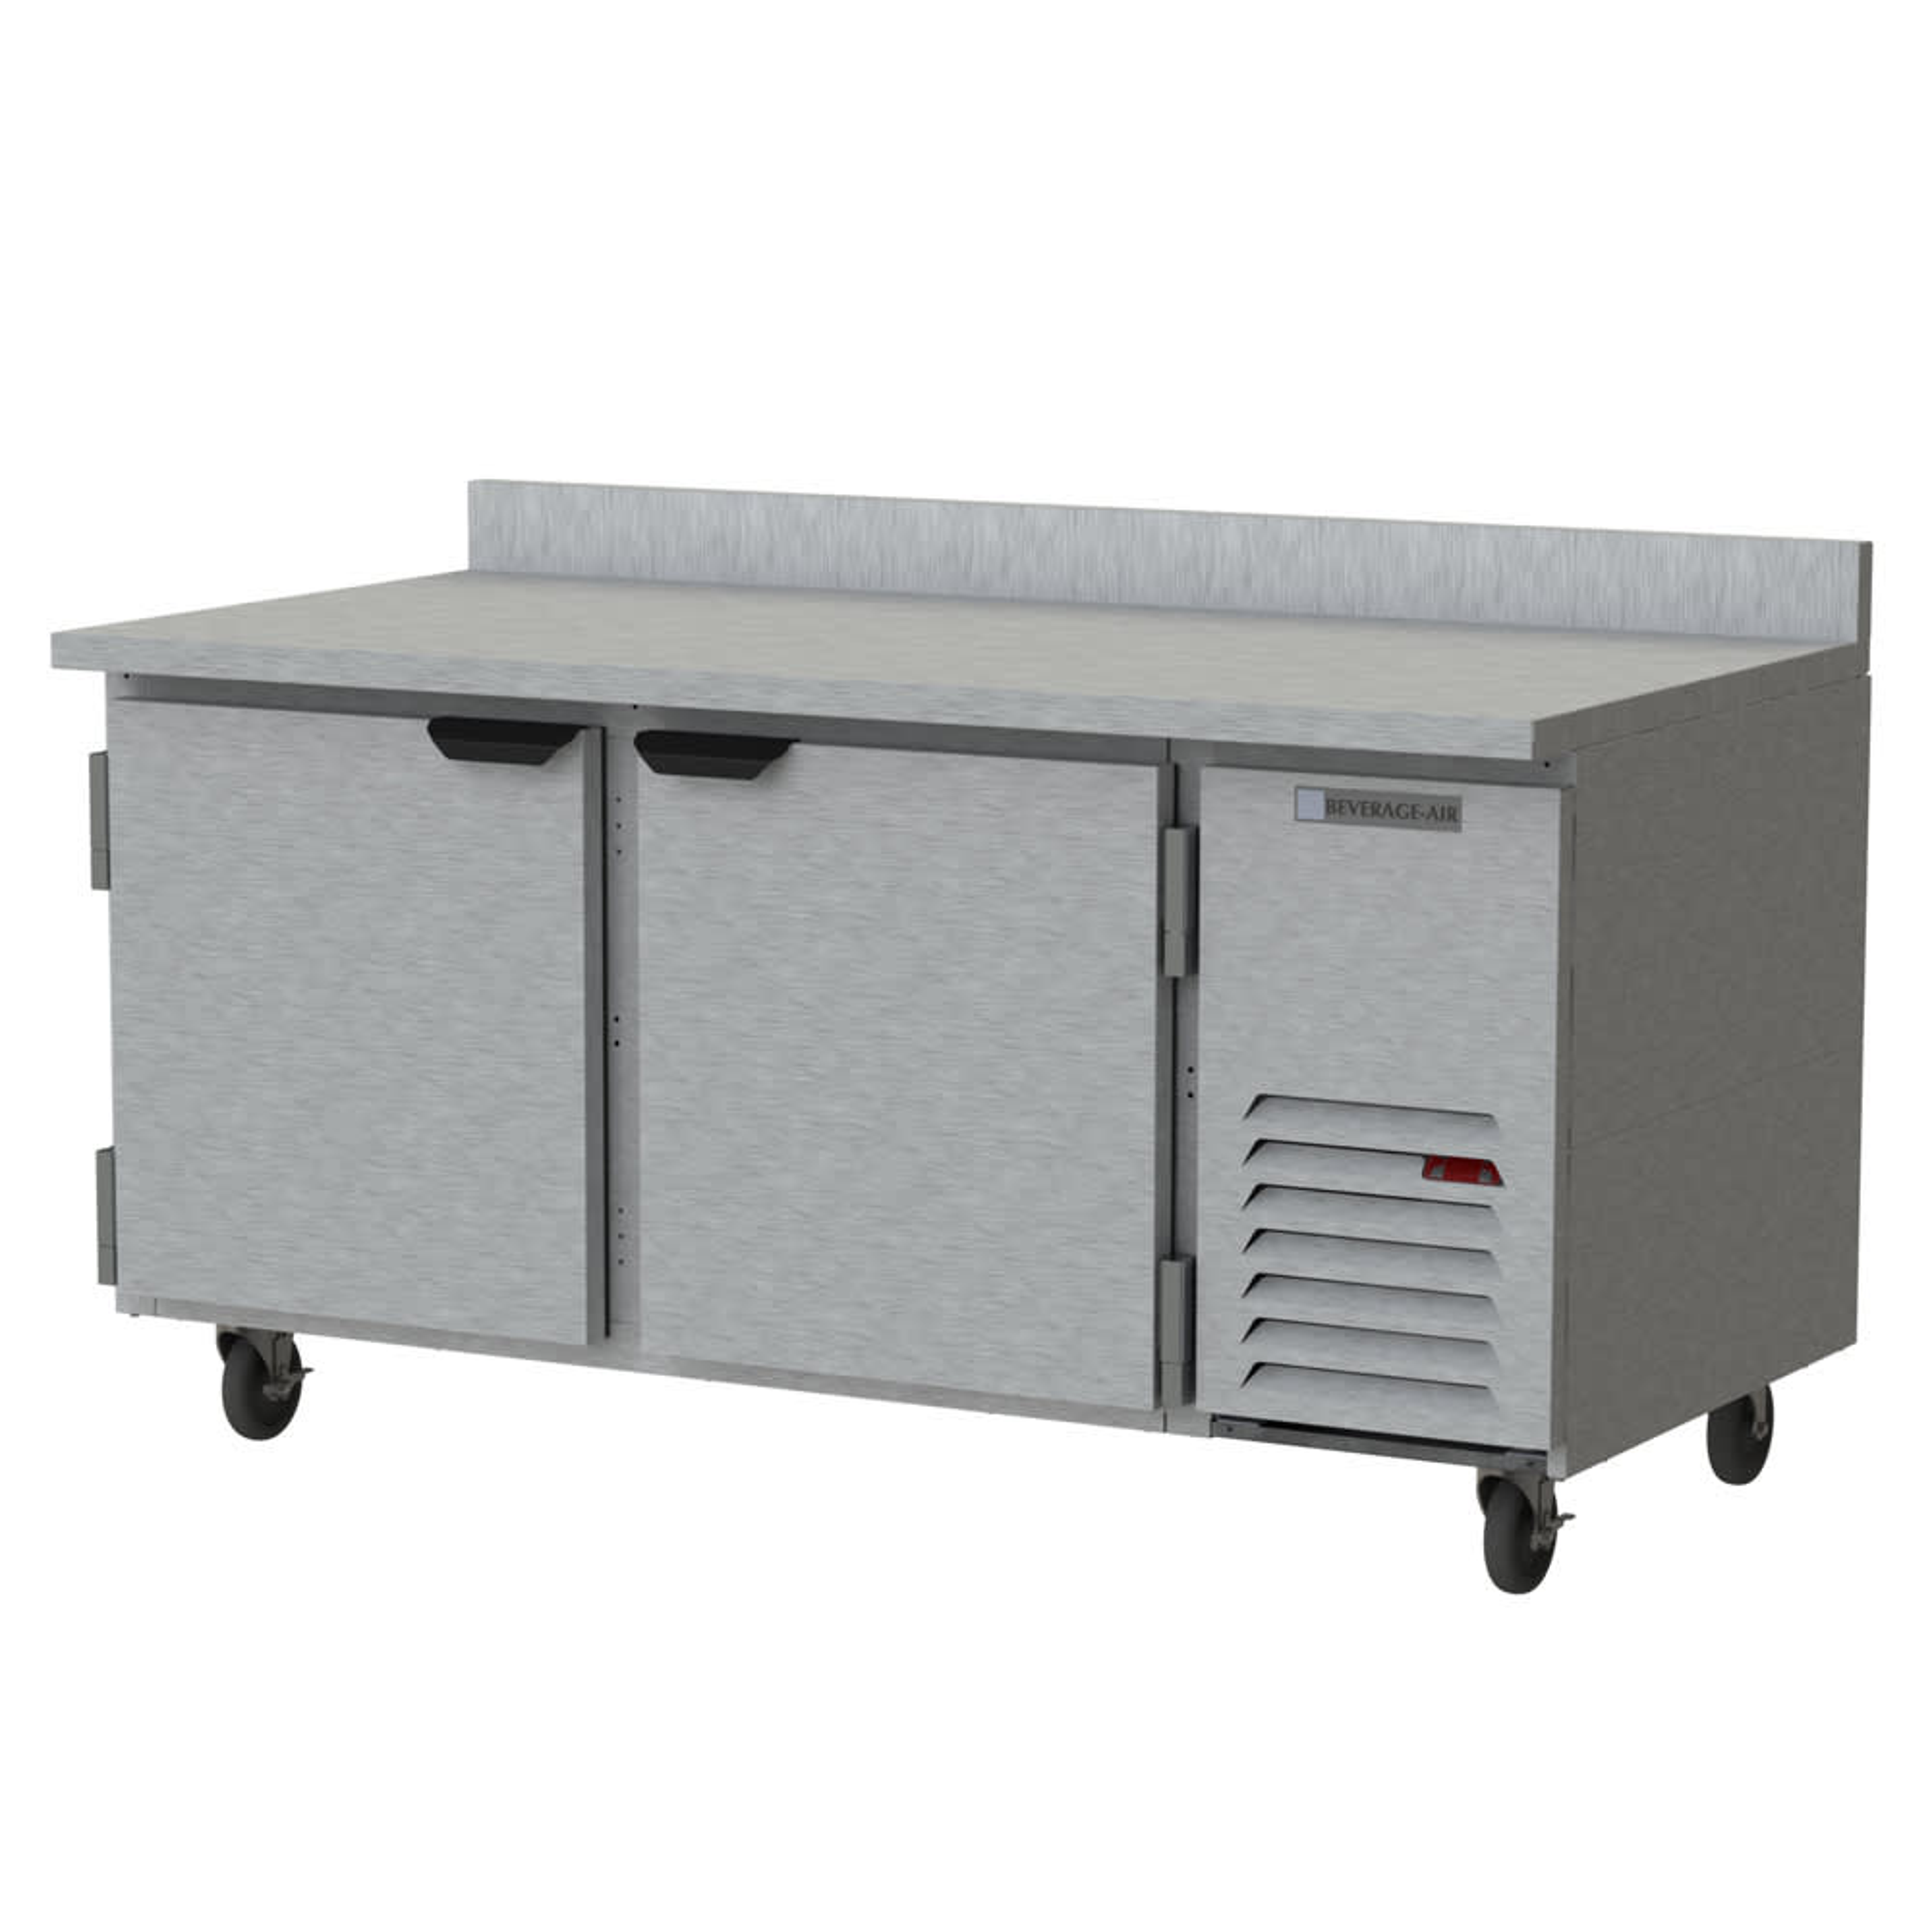 "Beverage Air WTR67AHC 67"" Worktop Refrigerator w/ (2) Section, 115v"